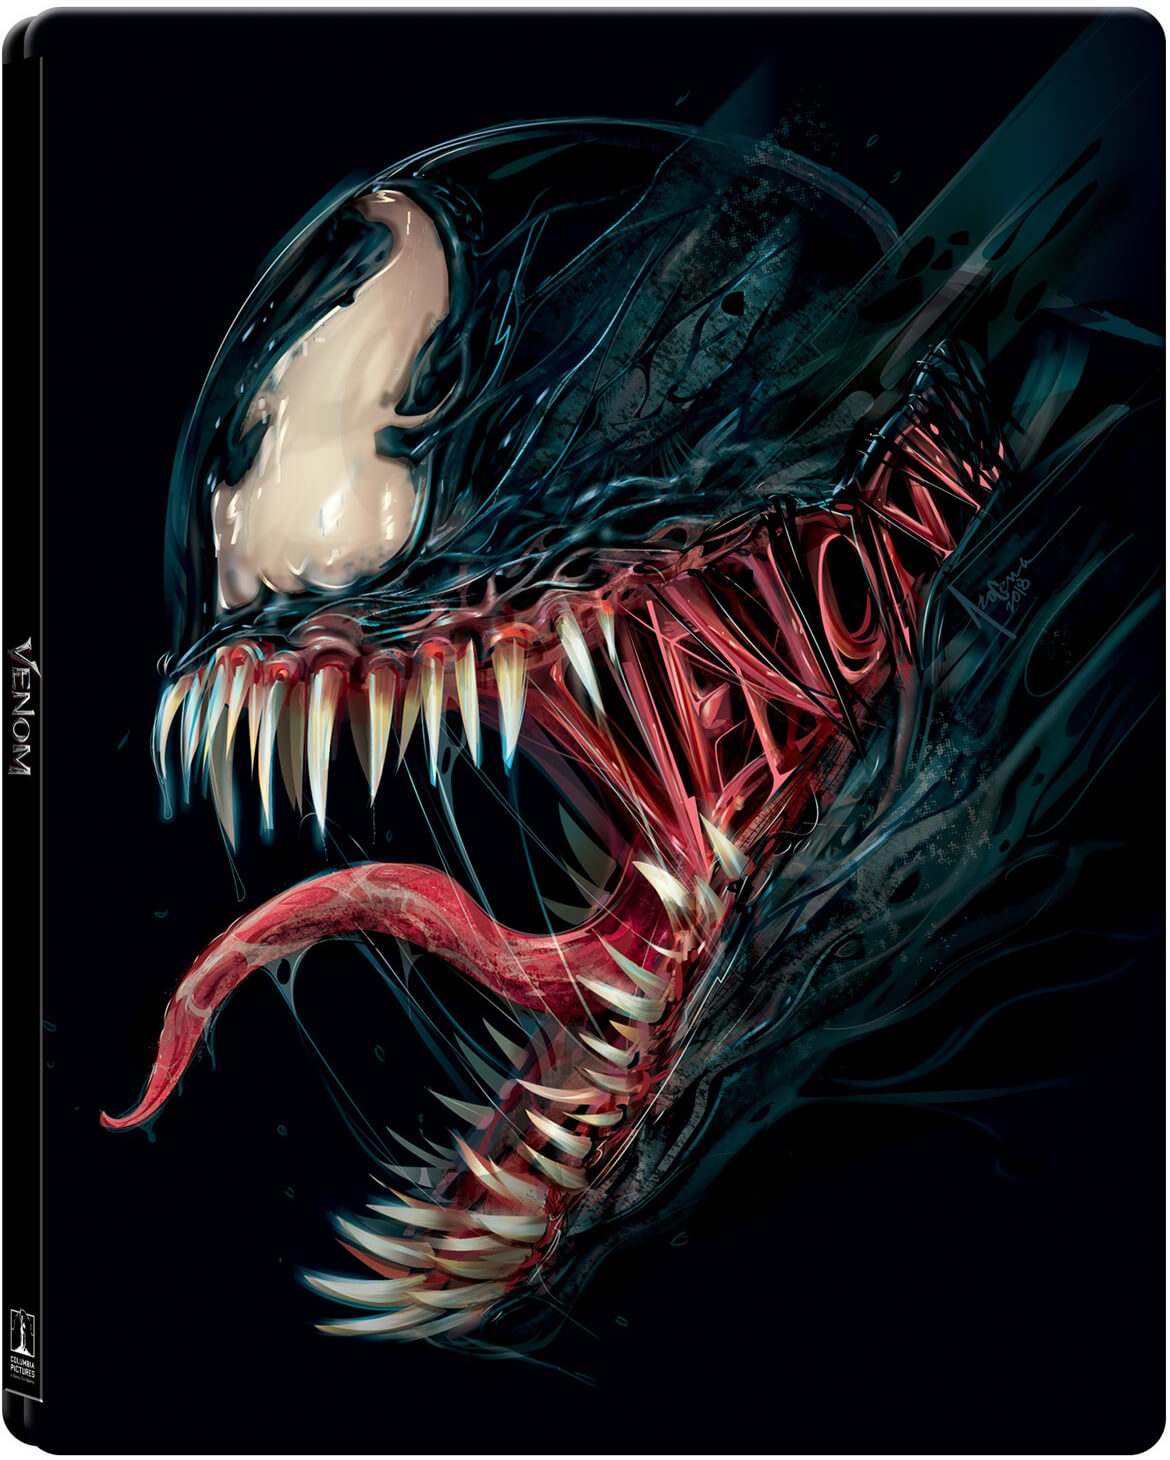 Venom Limited Edition Steelbook 4k Ultra Hd Includes Blu Ray Blu Ray Zavvi Australia